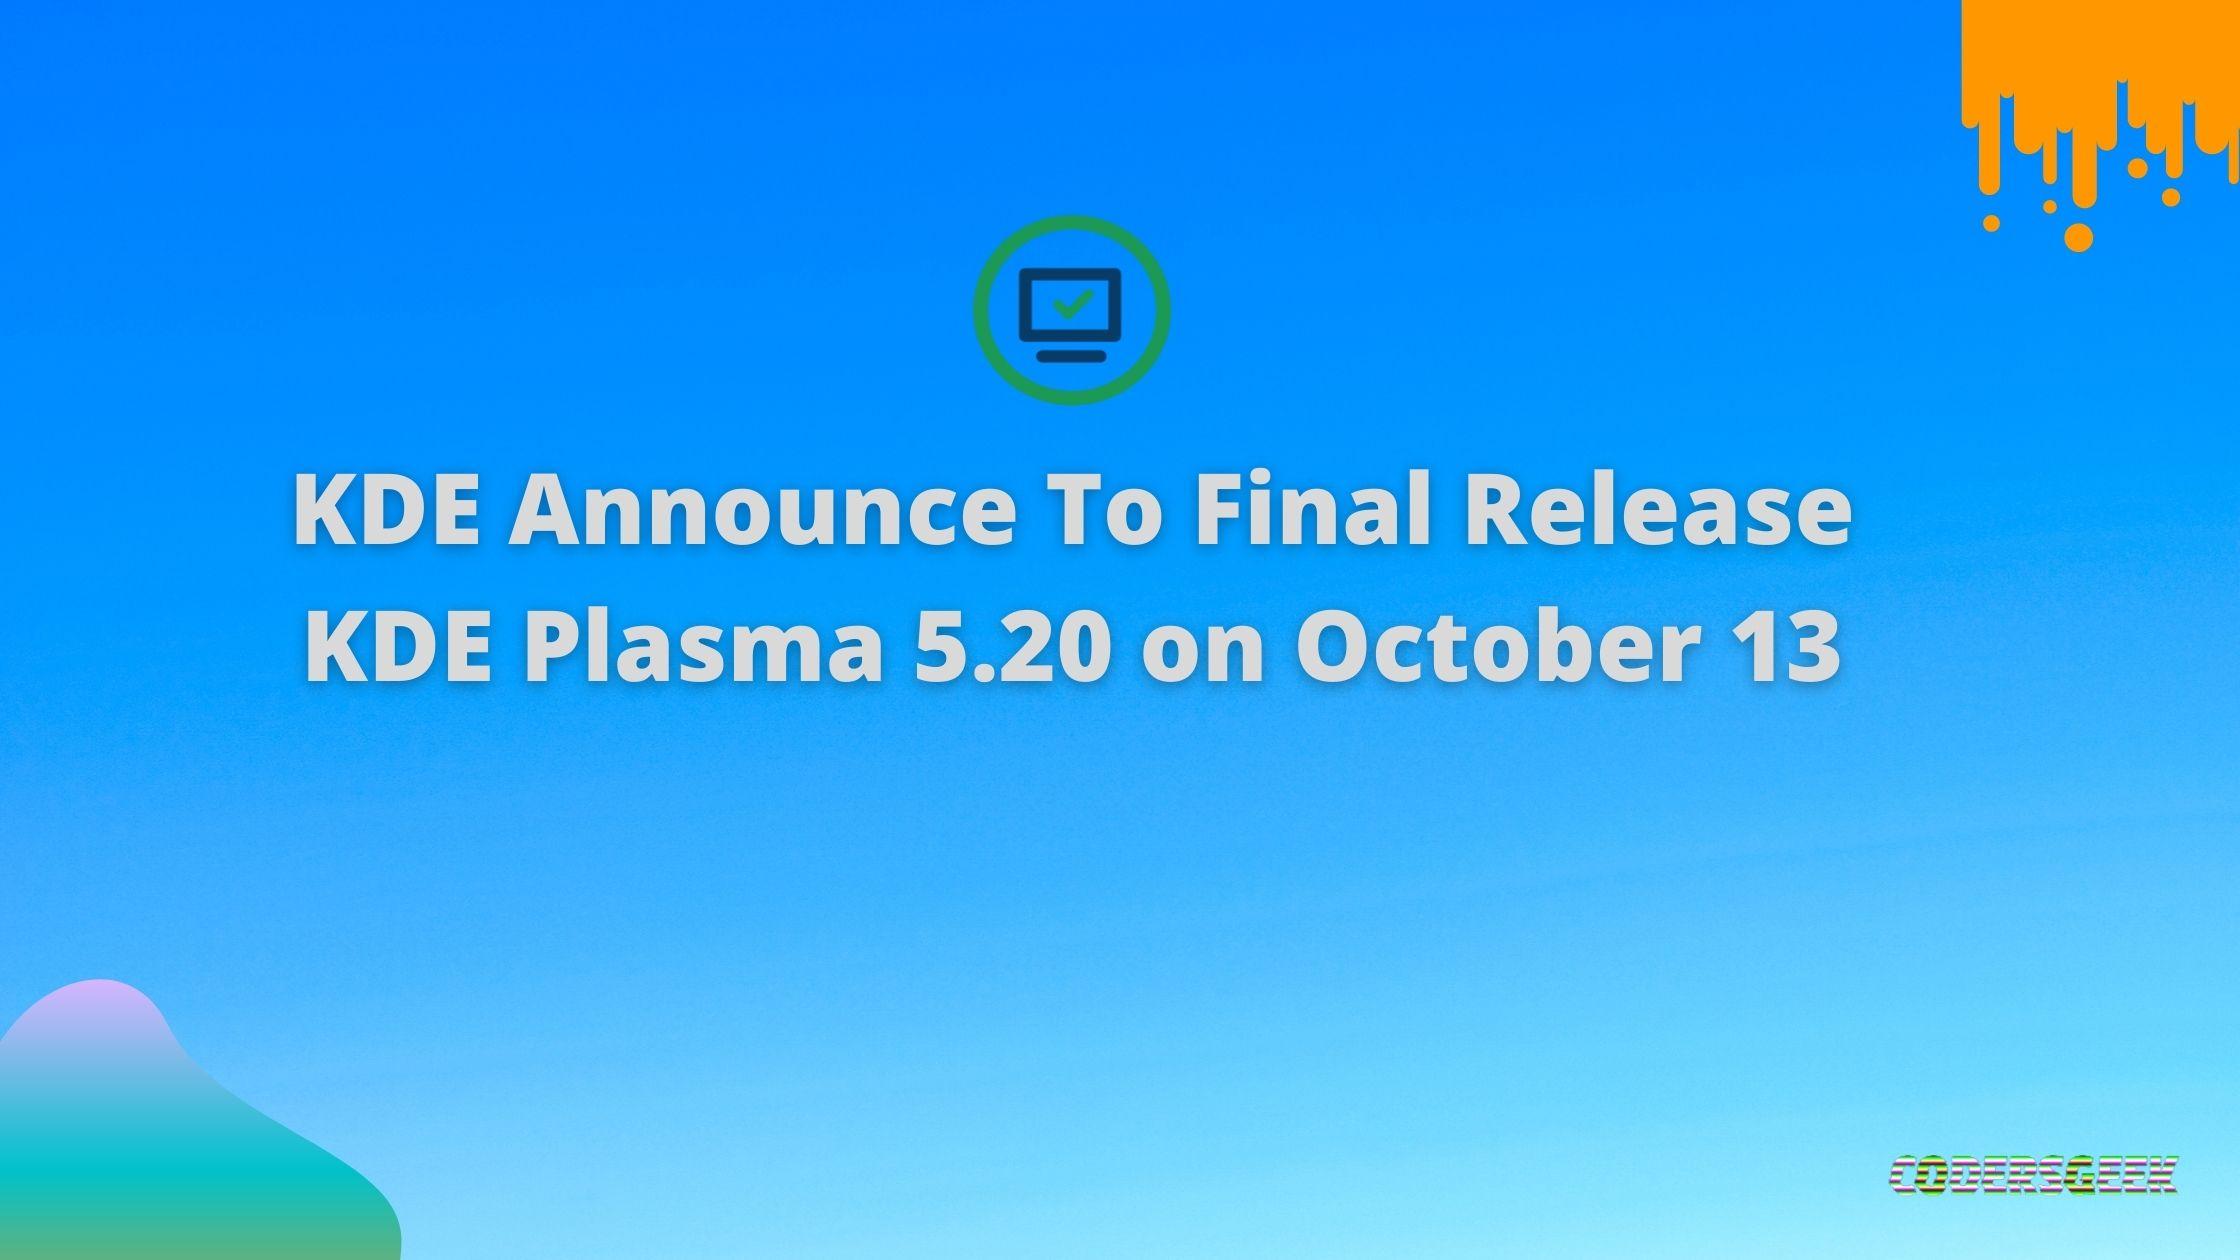 KDE Announce To Final Release KDE Plasma 5.20 on October 13